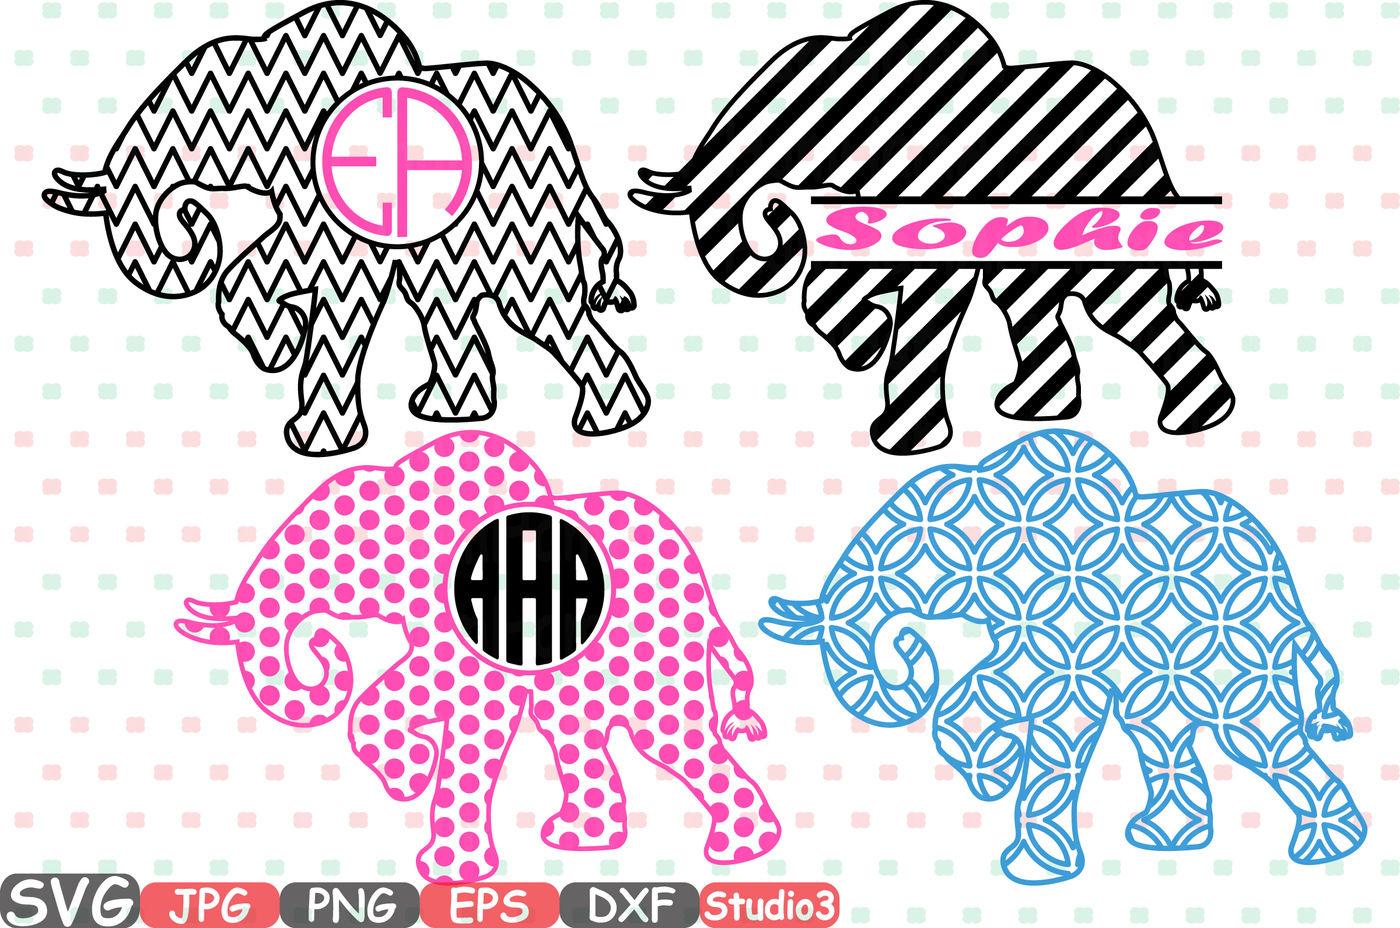 Elephant Frames Svg Silhouette Cutting Files Cricut Design Split